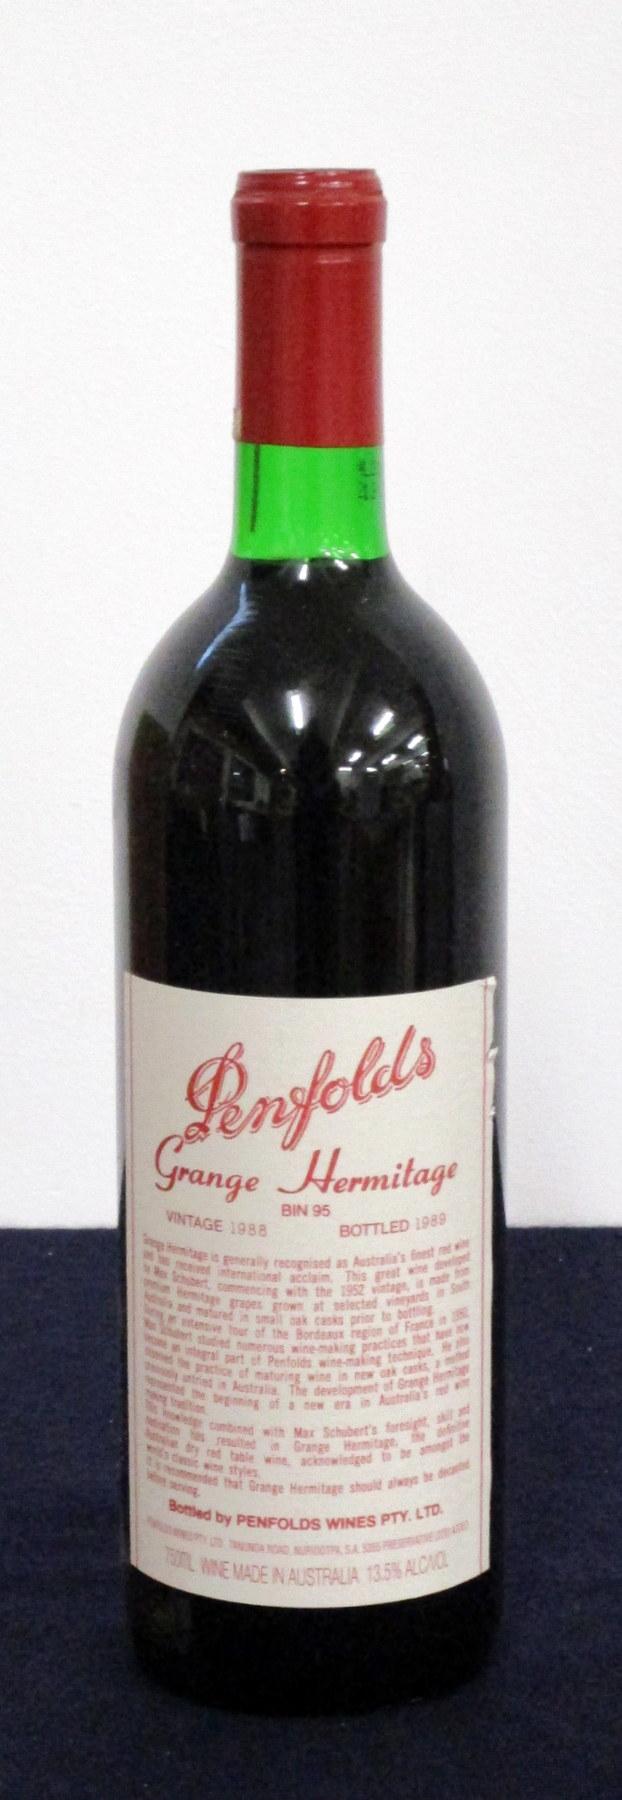 1 bt Penfolds Grange Hermitage Bin 95 1988 South Australia vts